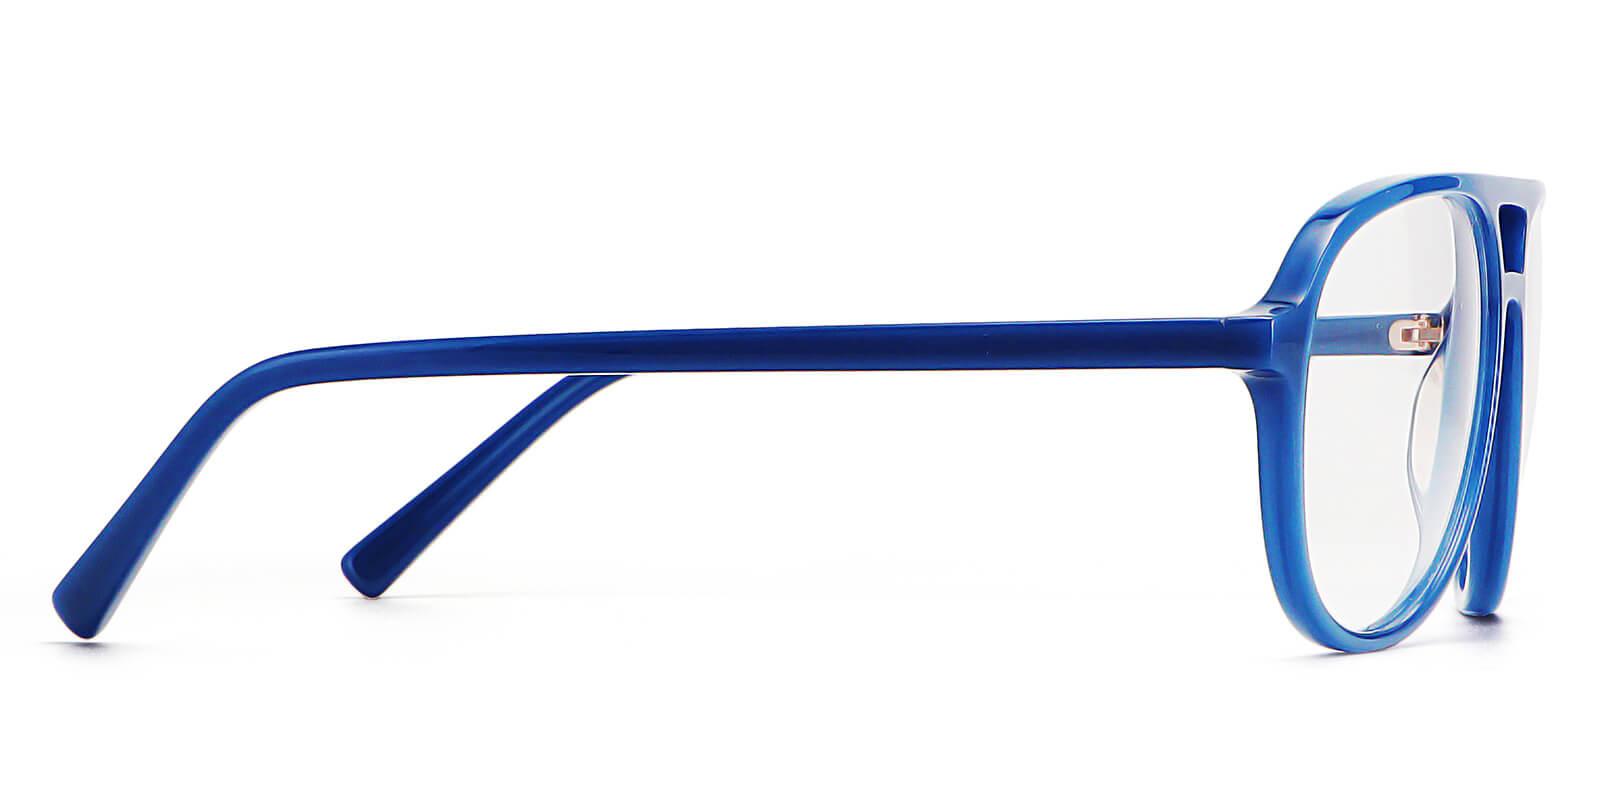 Marshal-Aquare aviator glasses : double-bridge acetate glasses